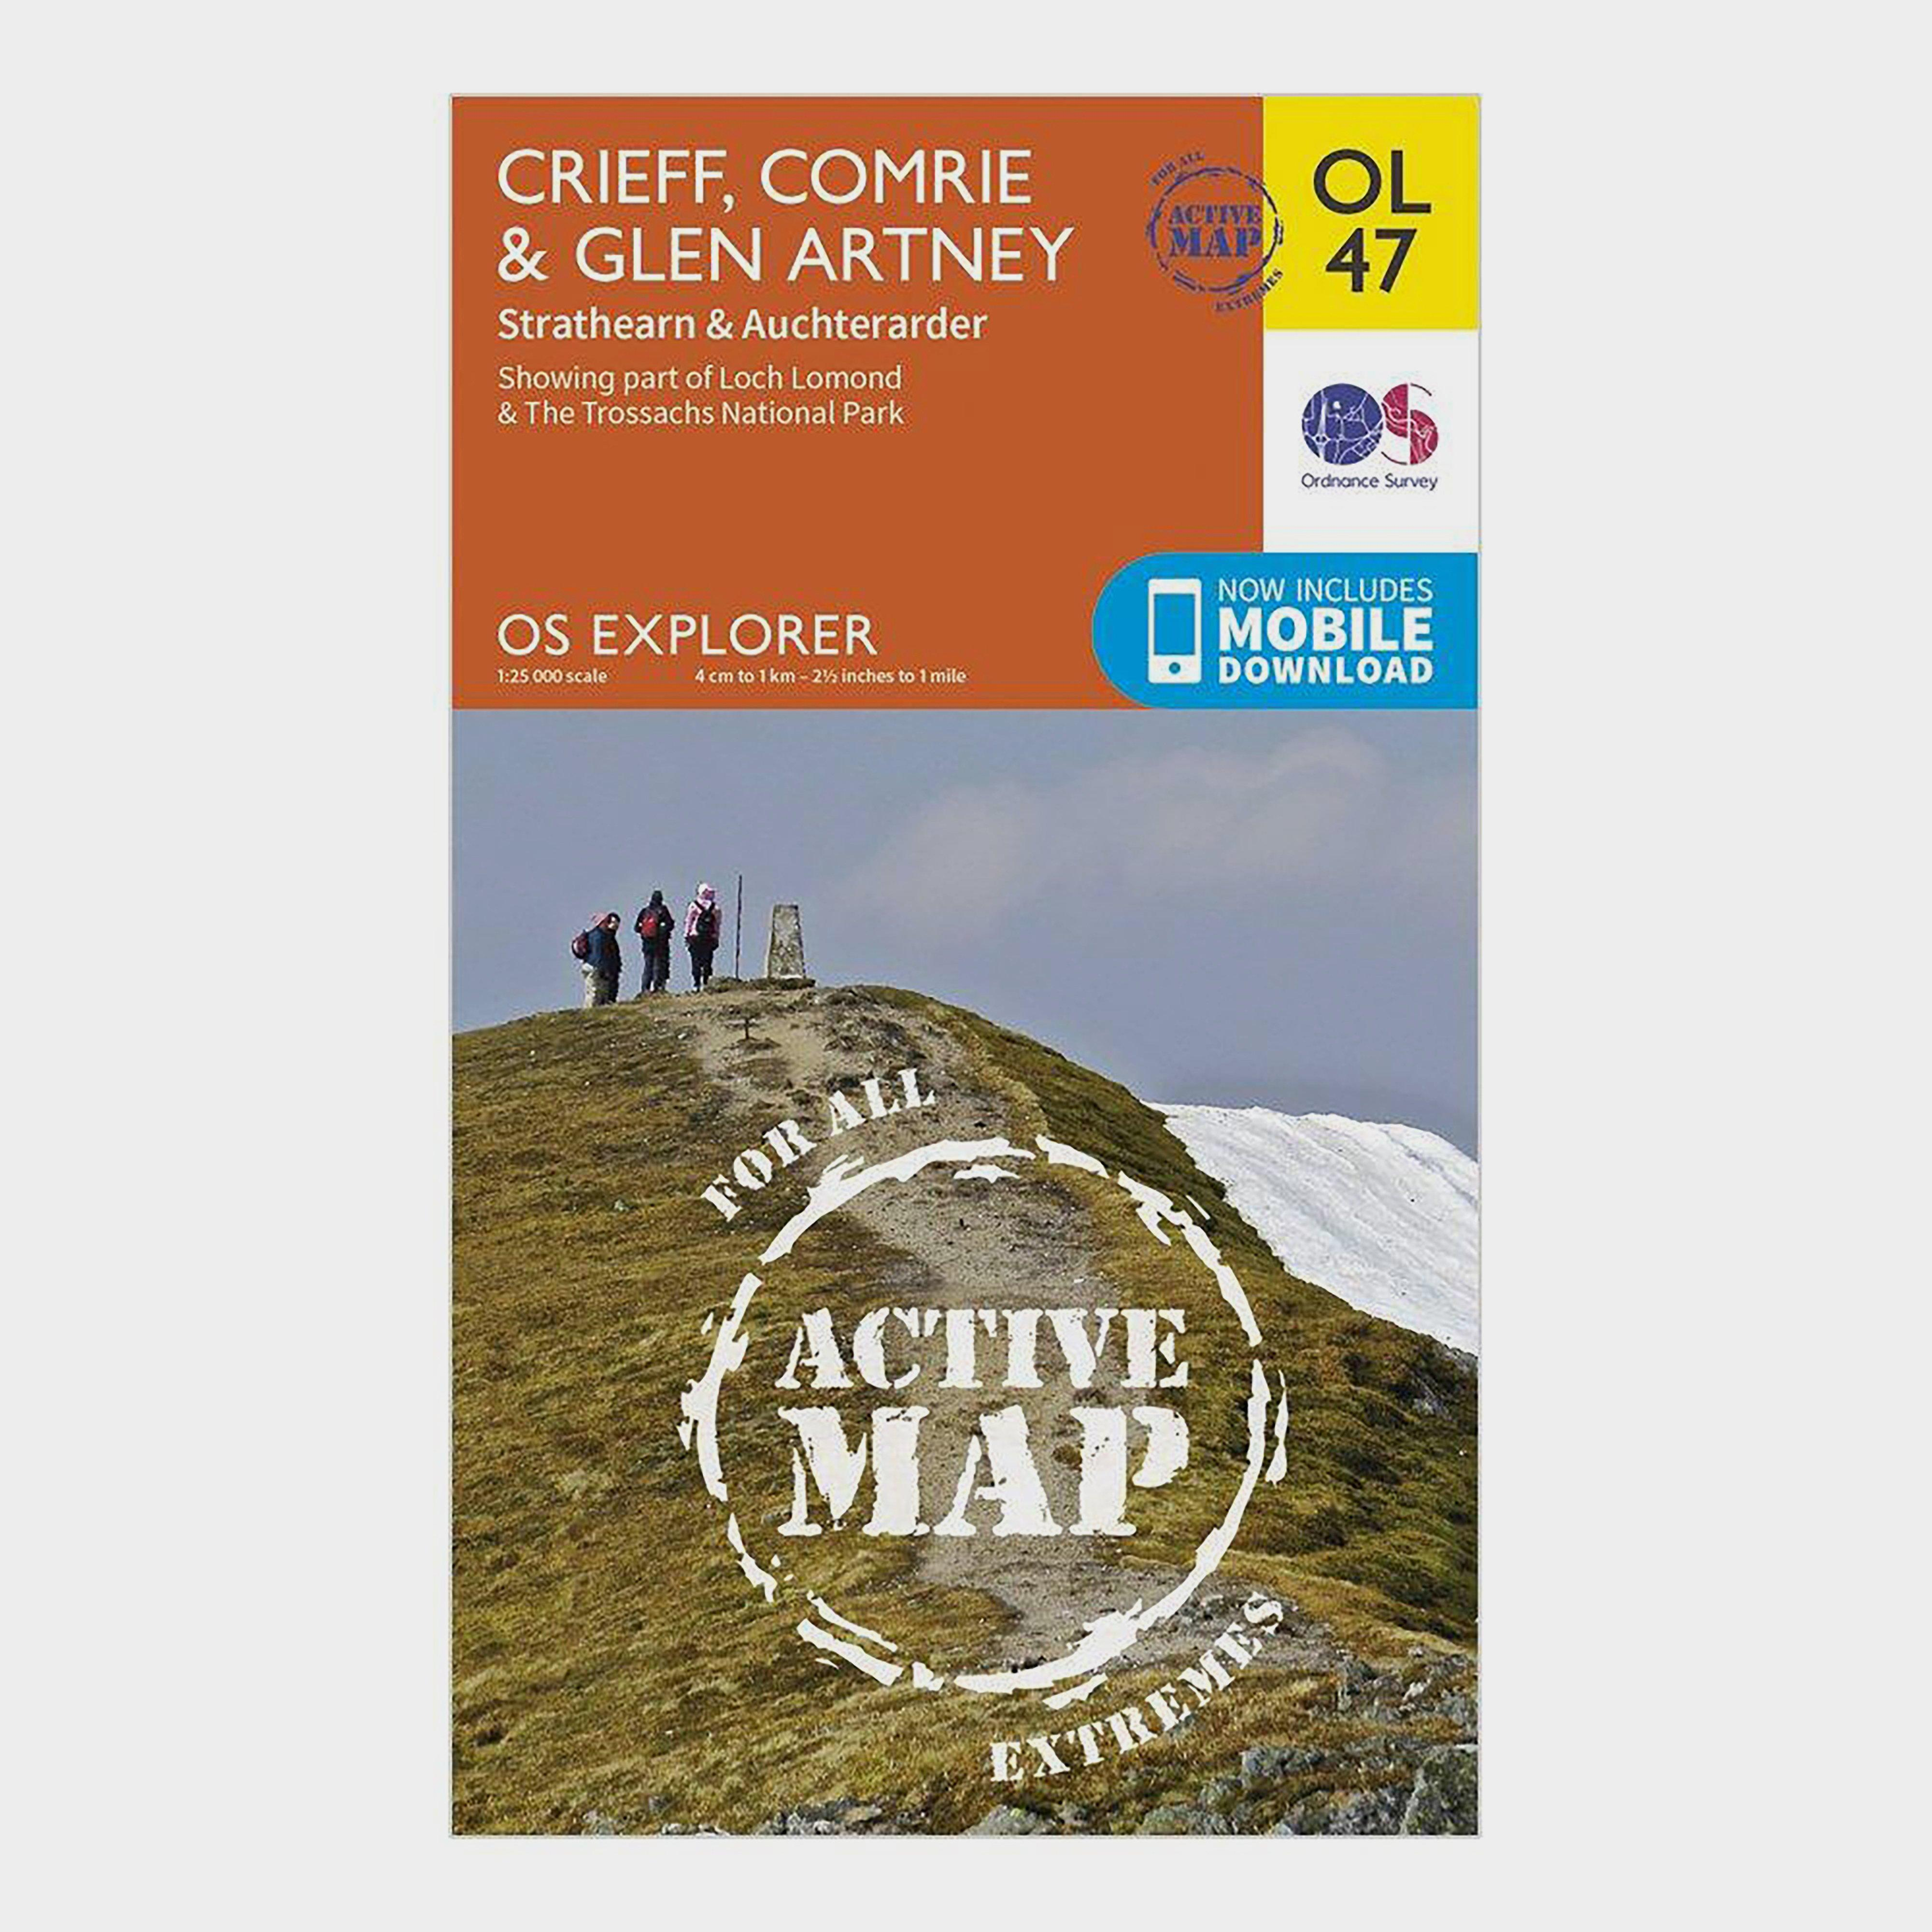 Ordnance Survey Active Explorer OL 47 Crieff, Comrie & Glen Artney Map, Orange/D